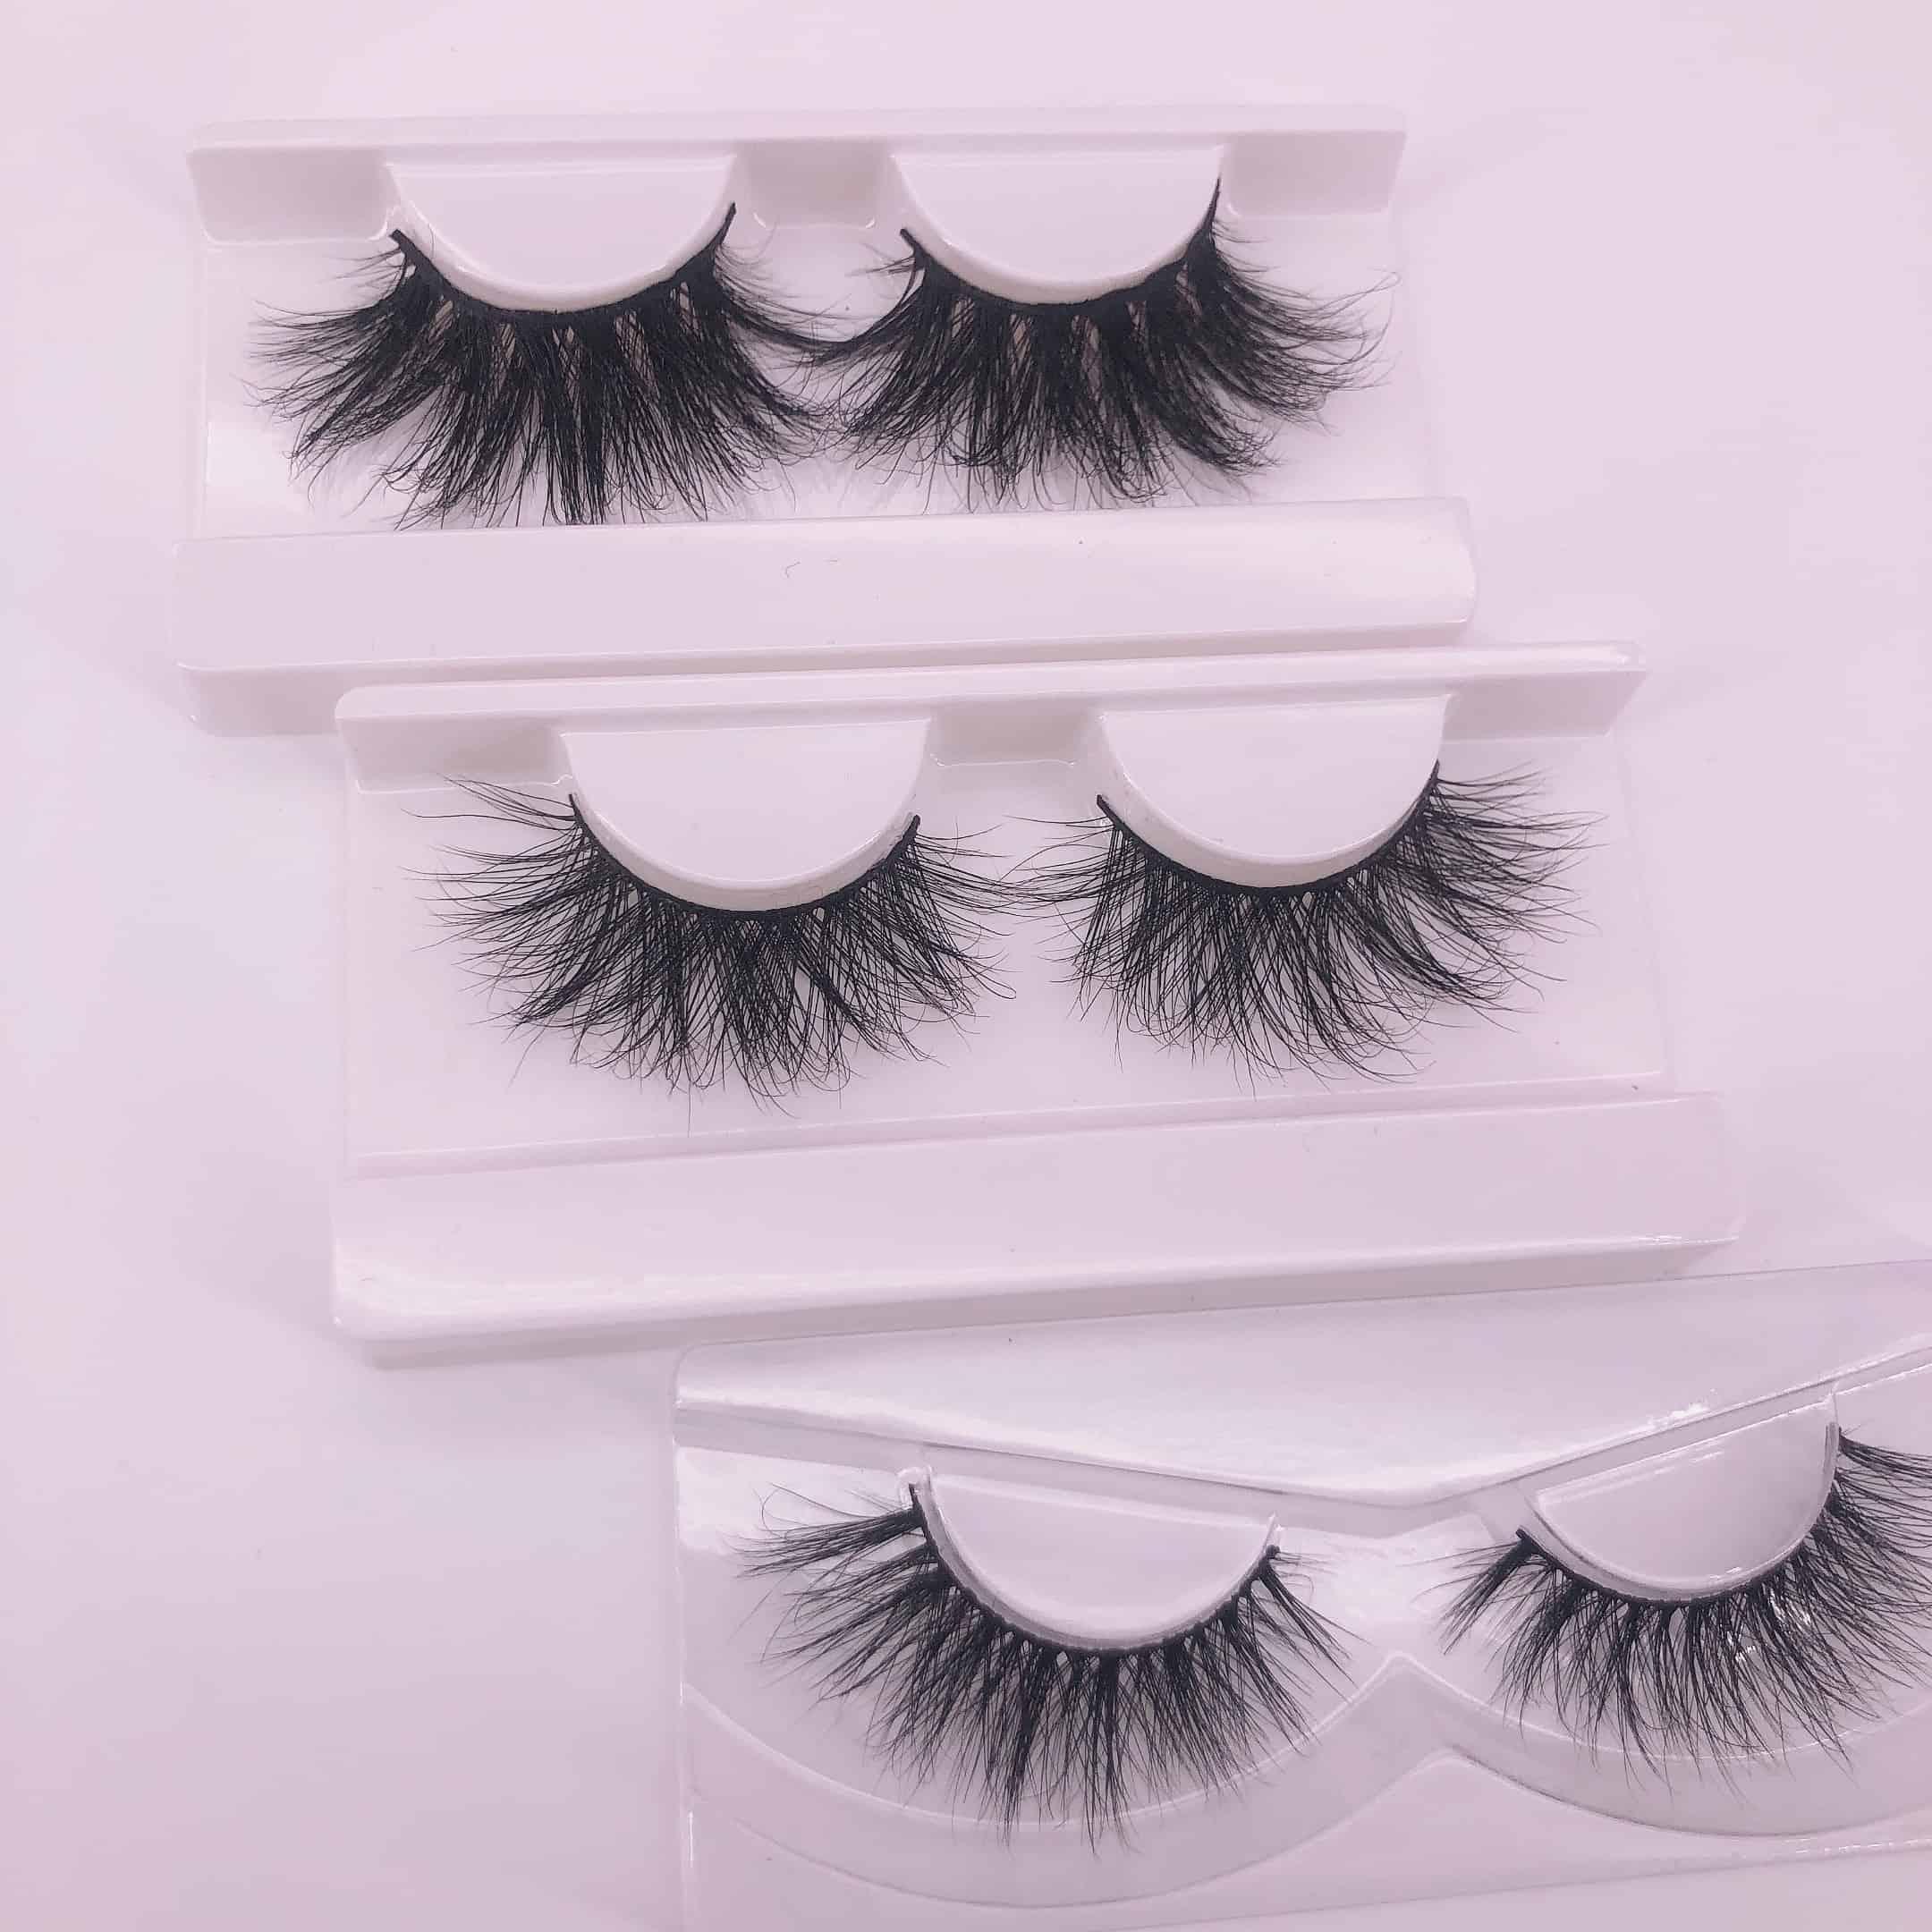 20mm lashes VS 25mm lashes VS 16mm lashes